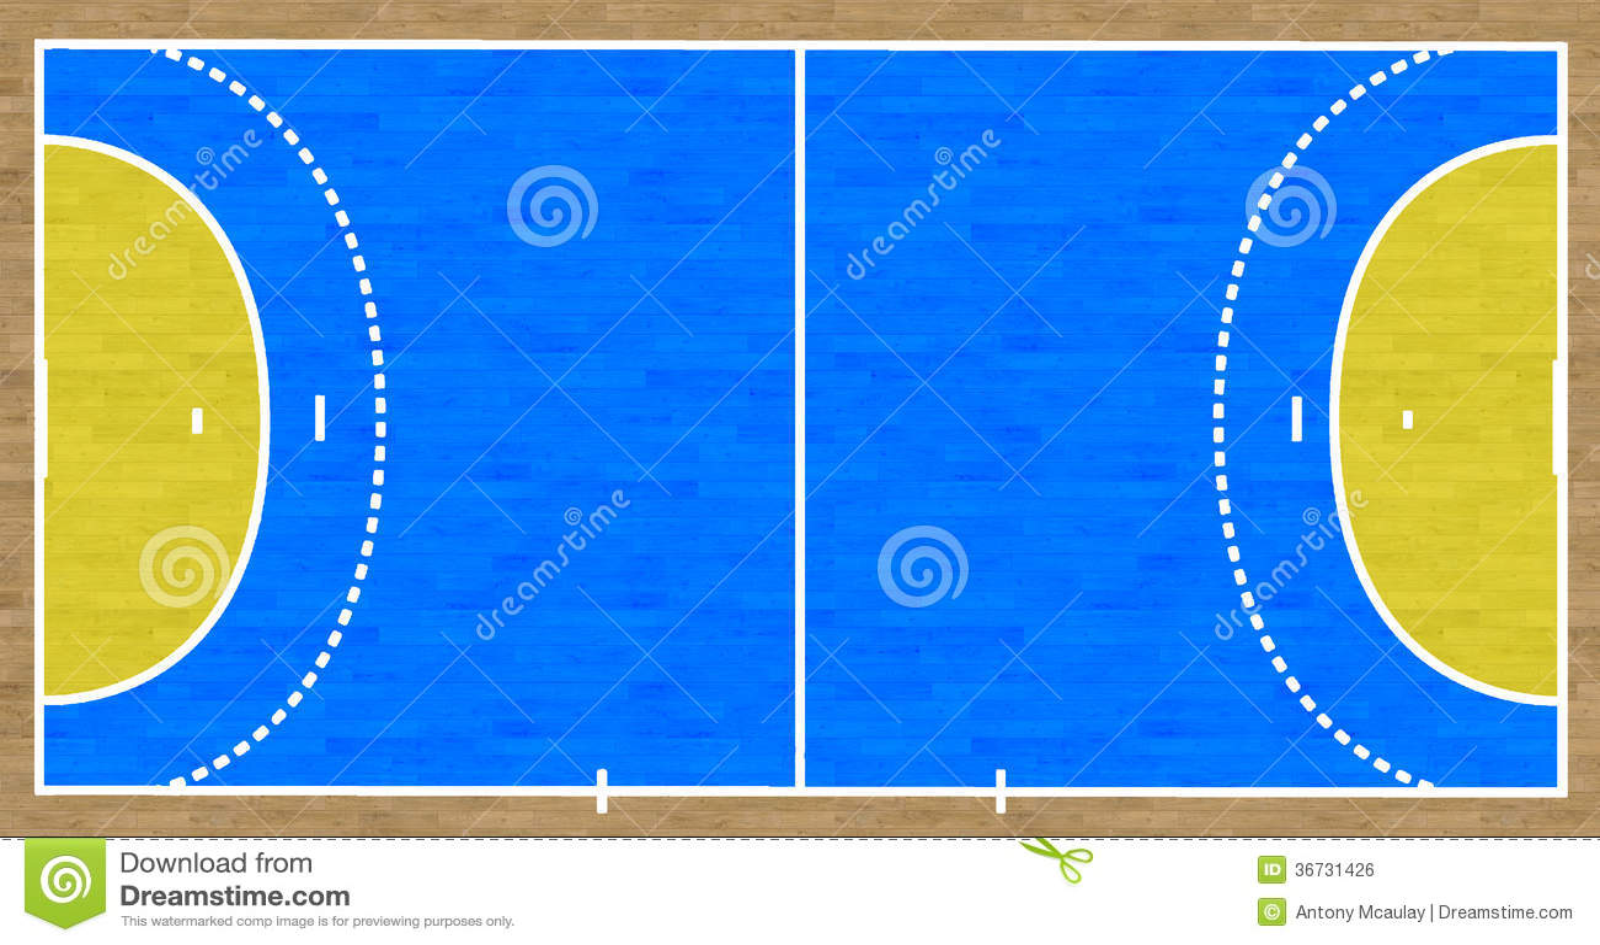 handball court stock illustration illustration of game 36731426. Black Bedroom Furniture Sets. Home Design Ideas